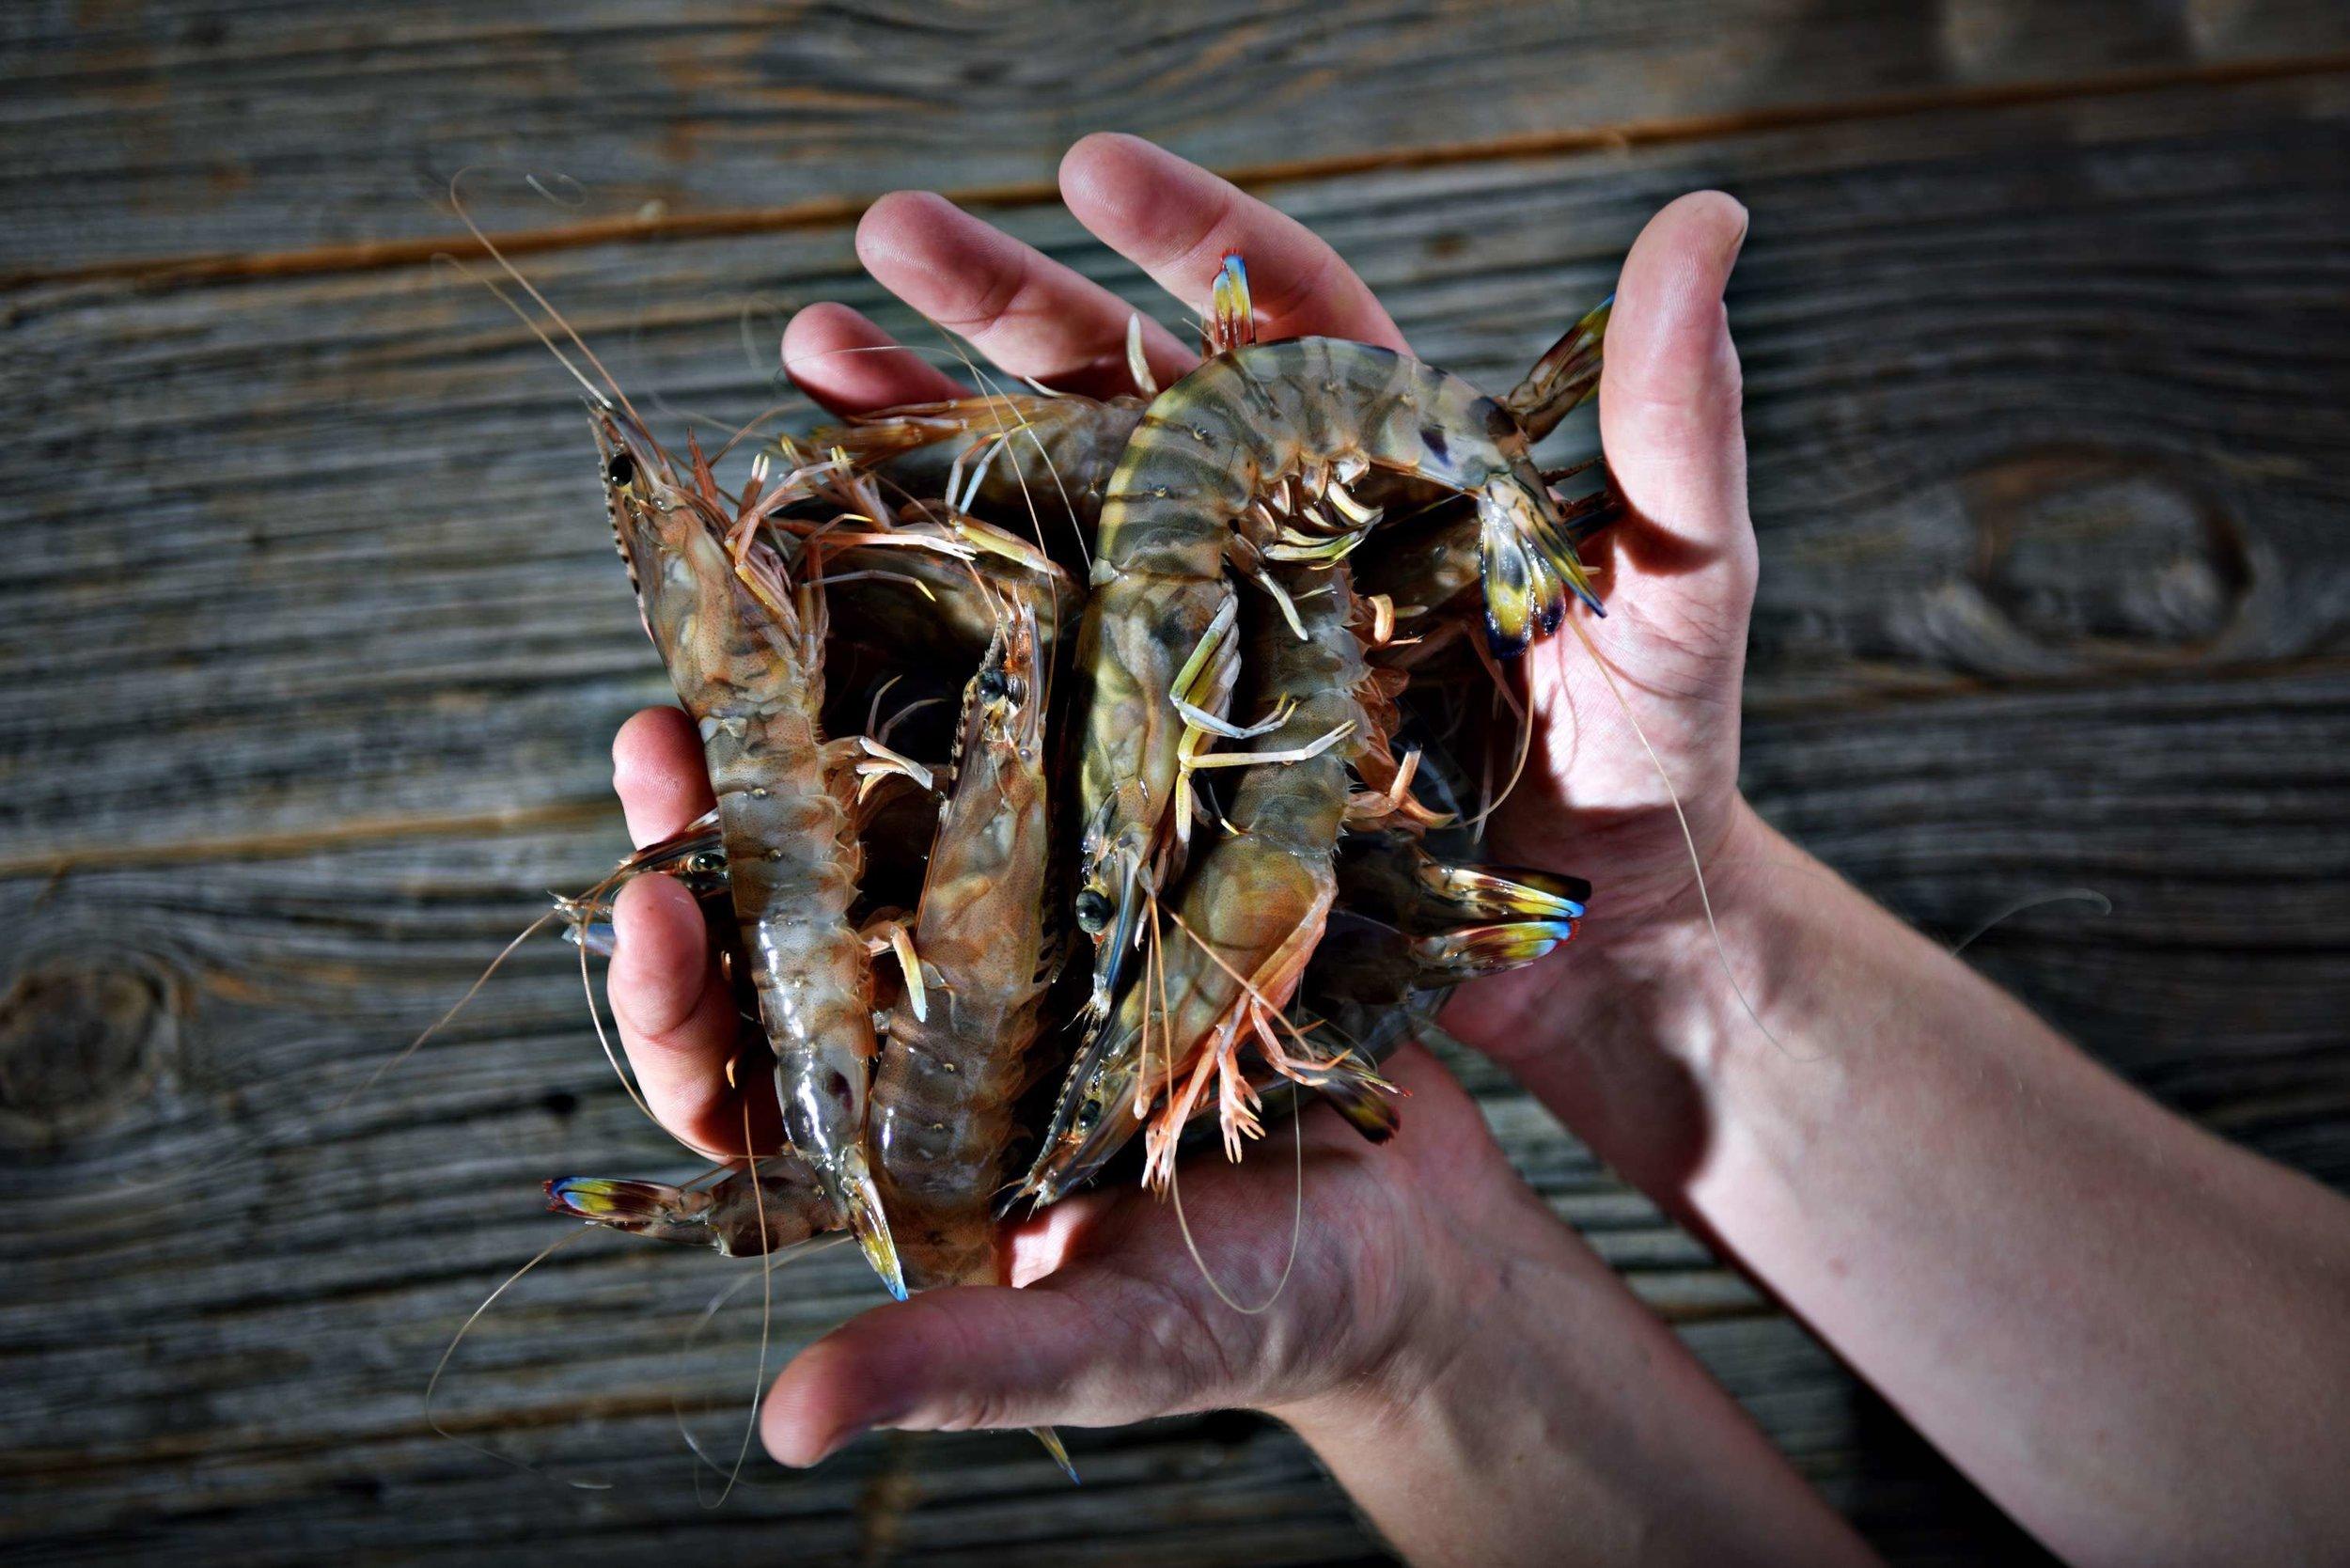 12 dome sur mer seafood schaal schelp kreeft restaurant bistro antwerpen frederic chabbert michelinstar bart albrecht tablefever.jpg